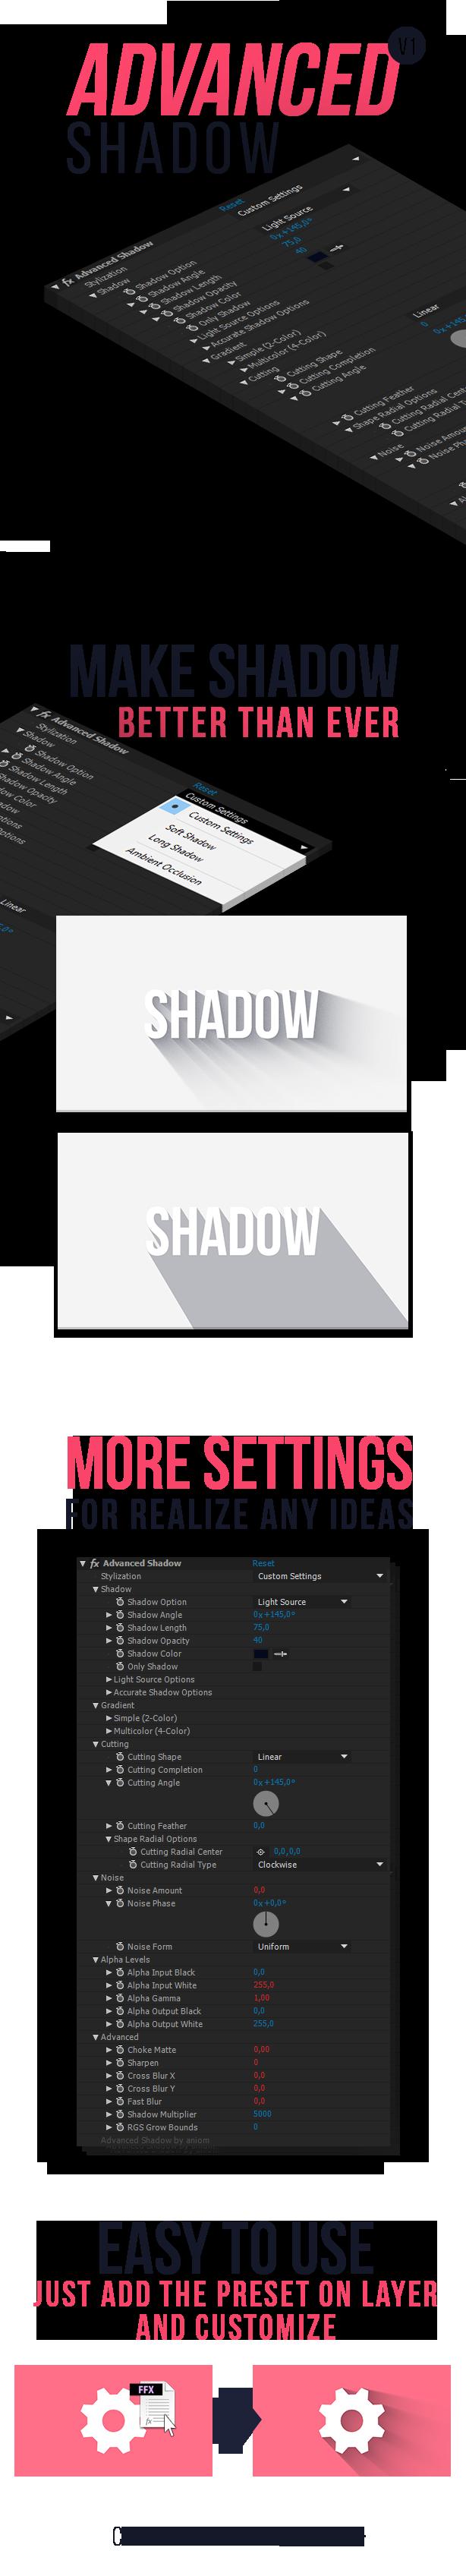 Advanced Shadow - 6